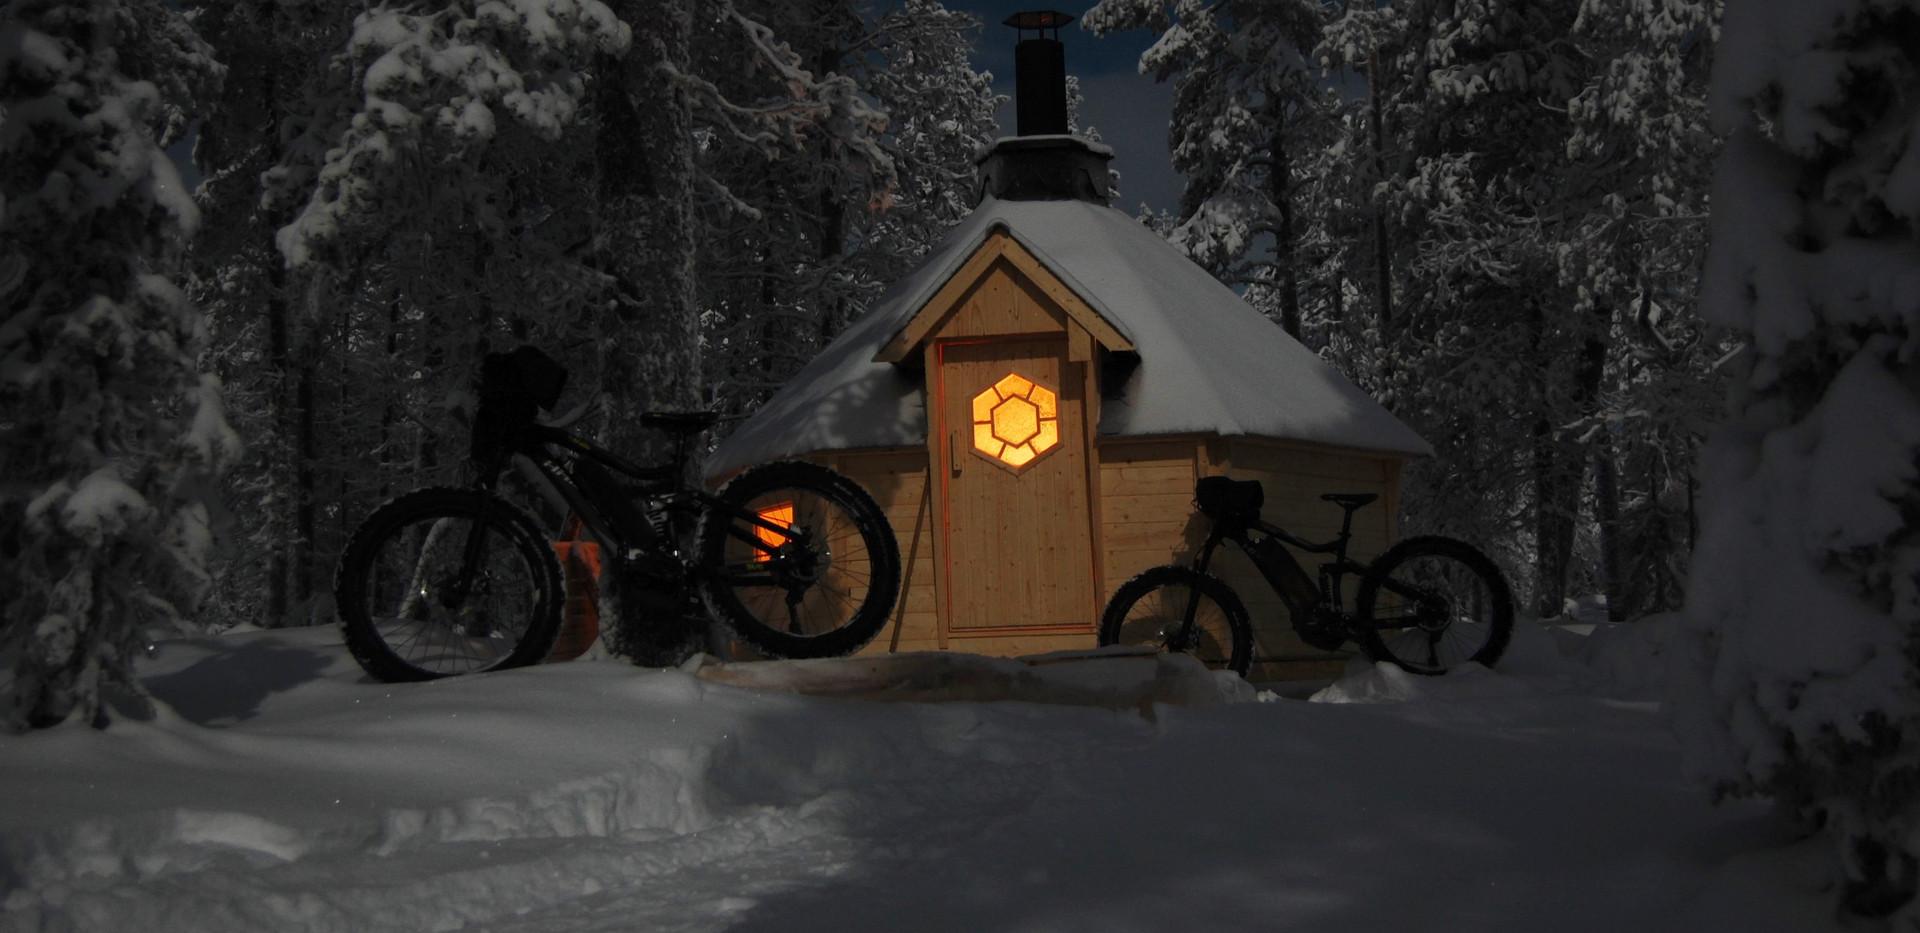 Break at the hut